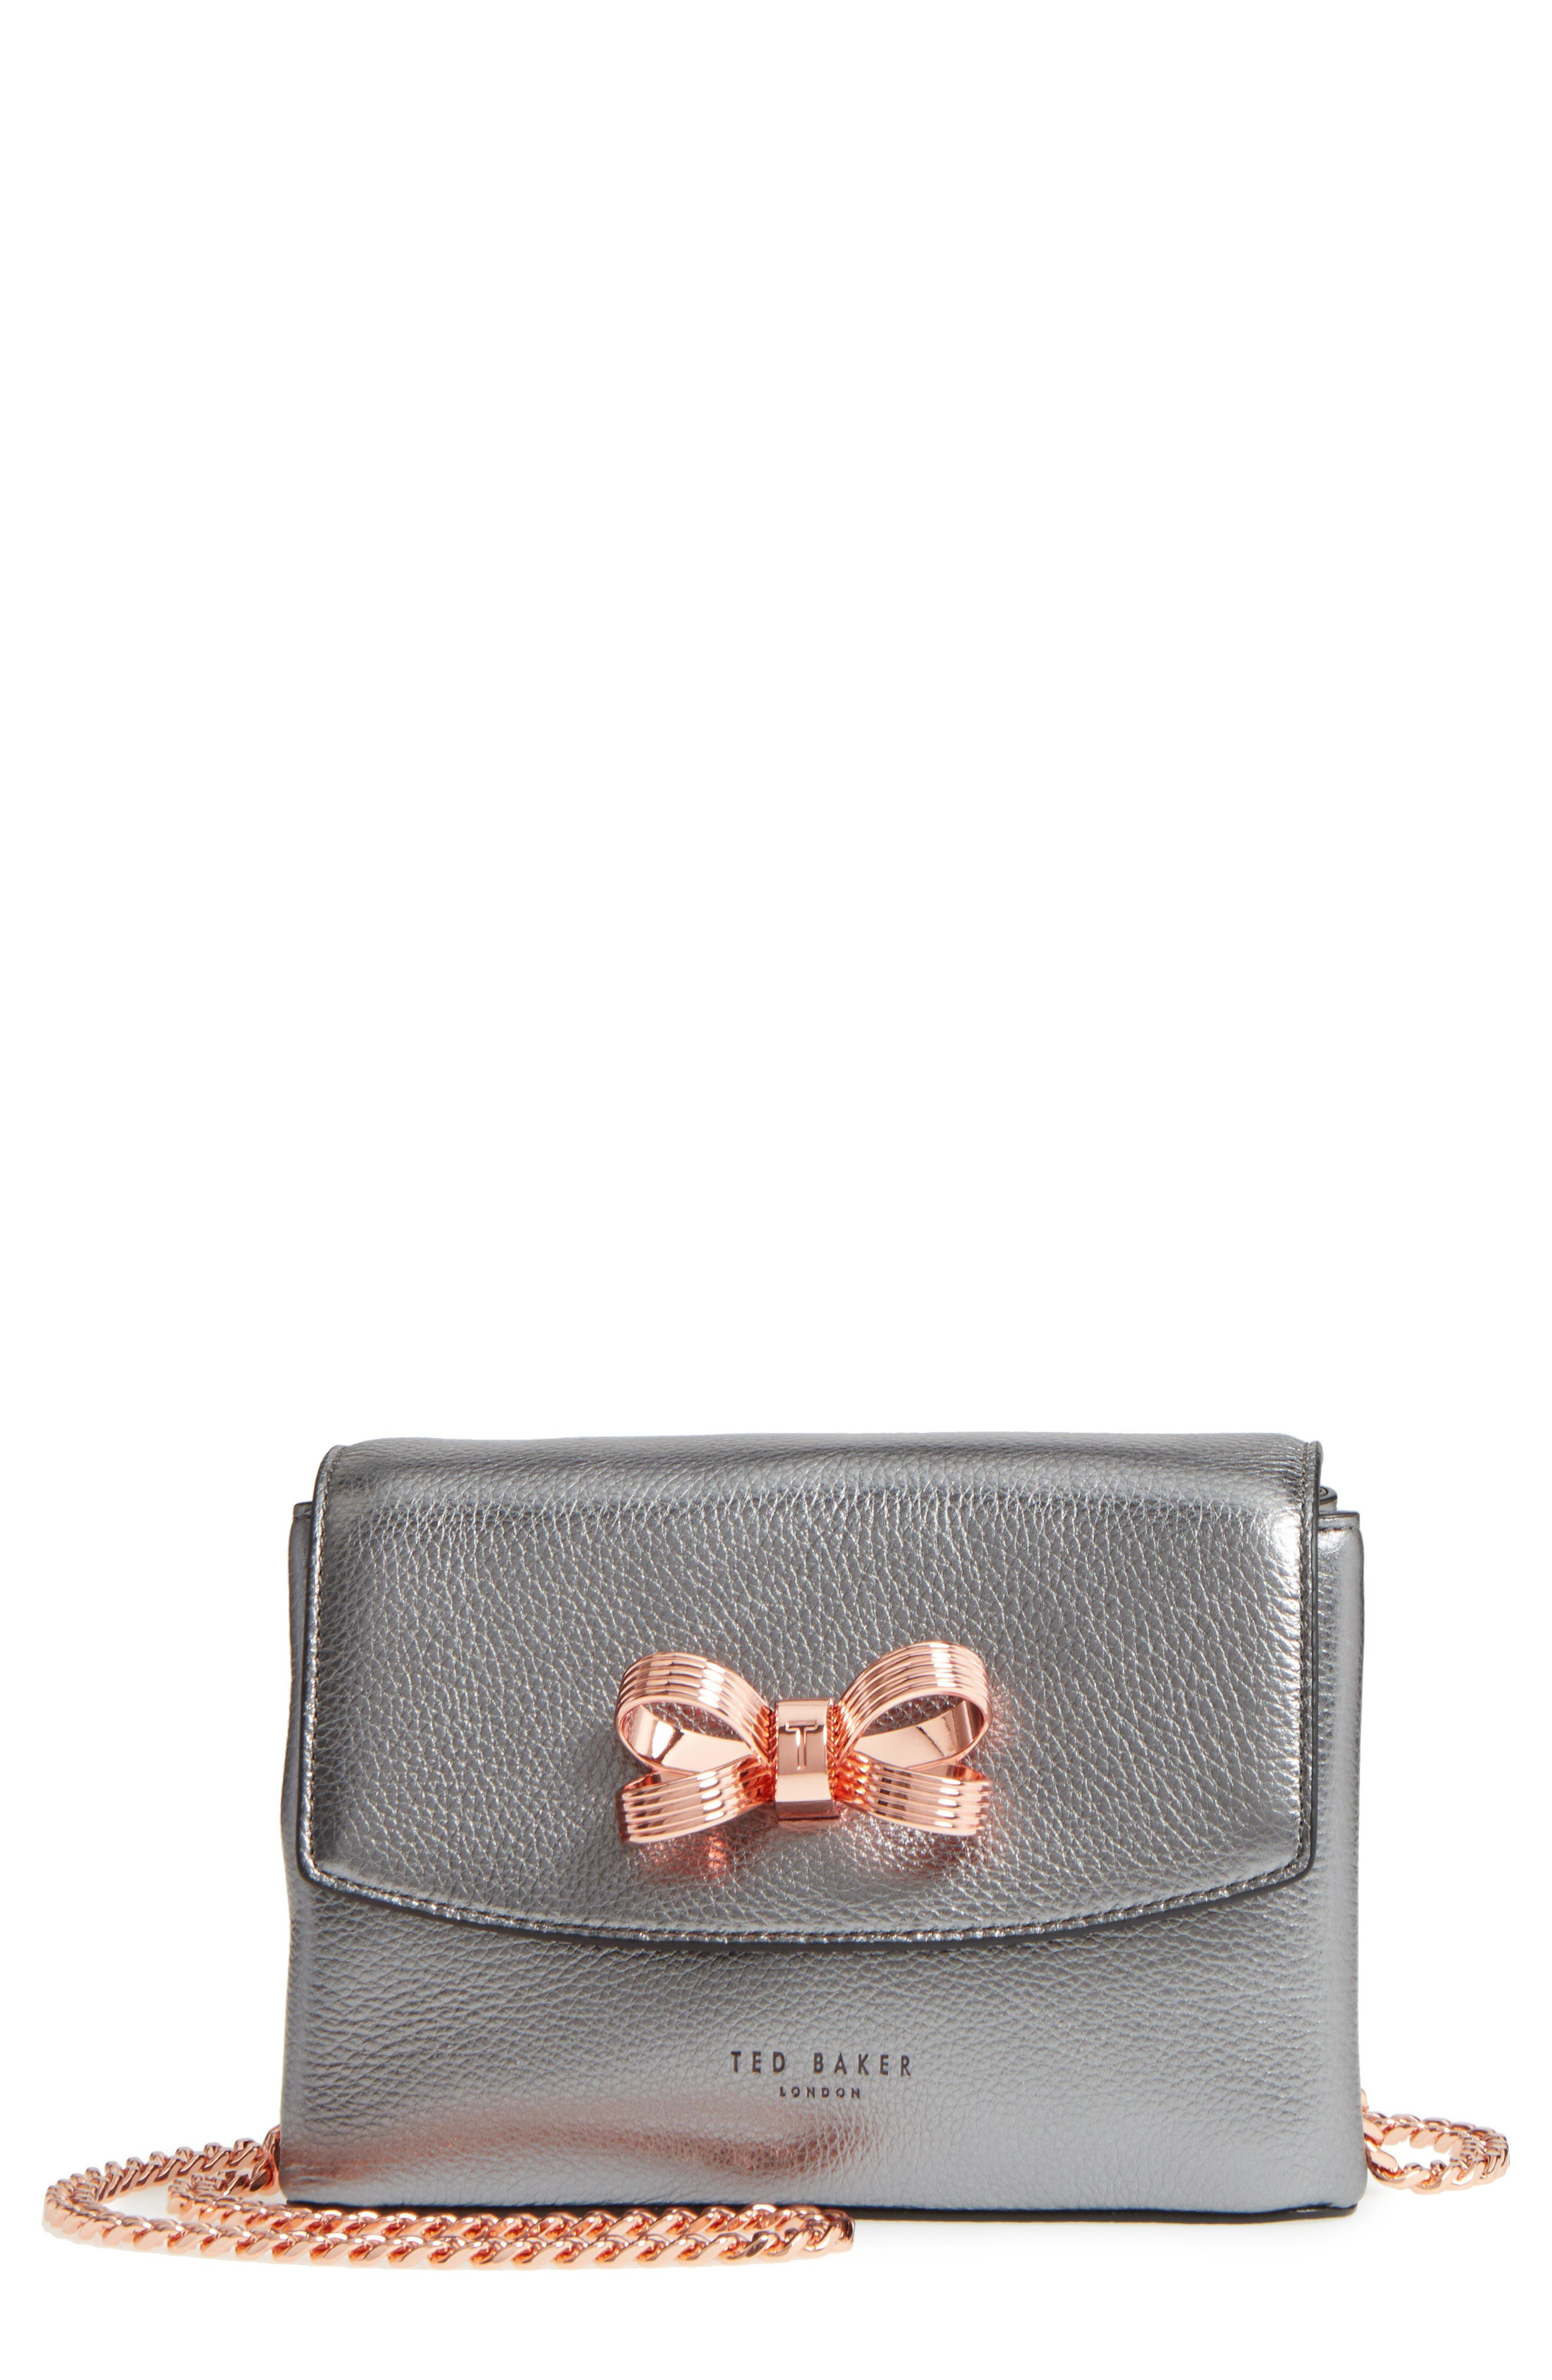 Ted Baker London Lupiin Metallic Leather Crossbody Bag